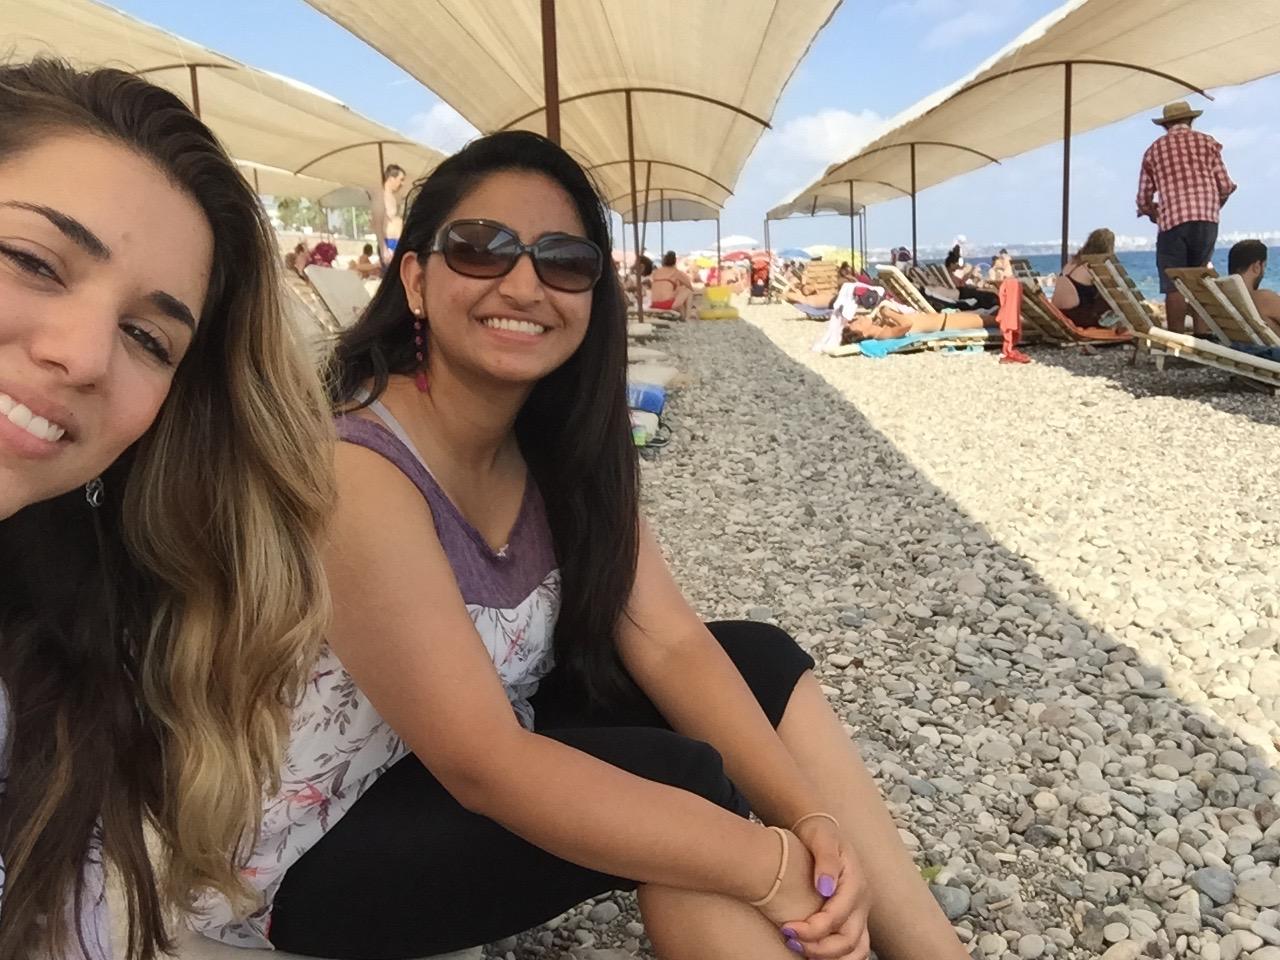 fetish escort sex on the beach